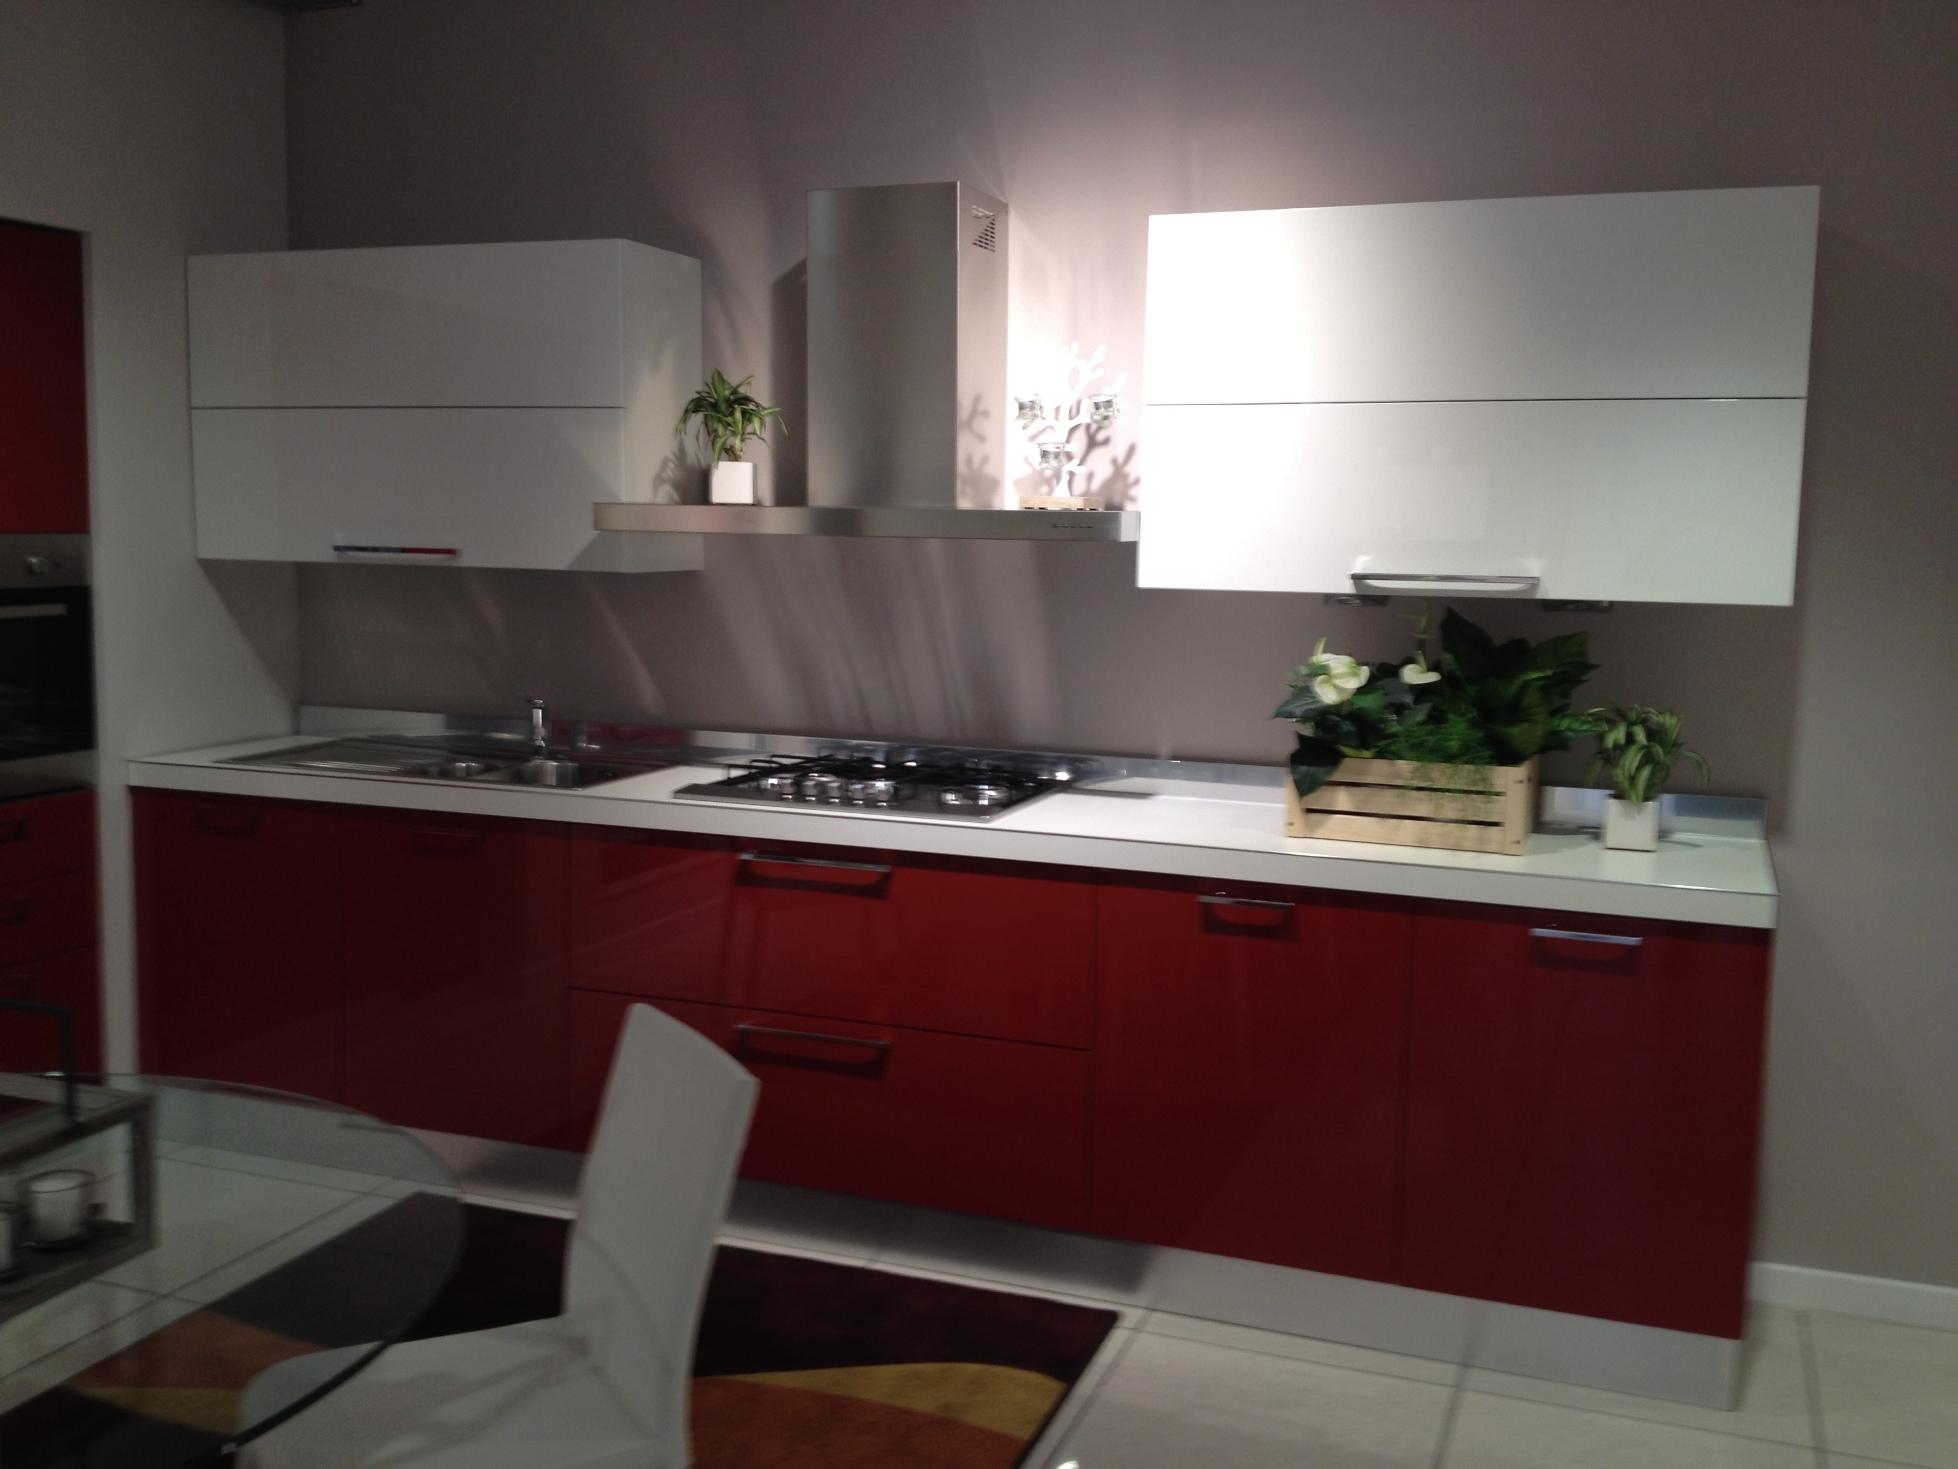 Scavolini cucina sax moderna laccato lucido rossa cucine a prezzi scontati - Cucina bianca e rossa ...